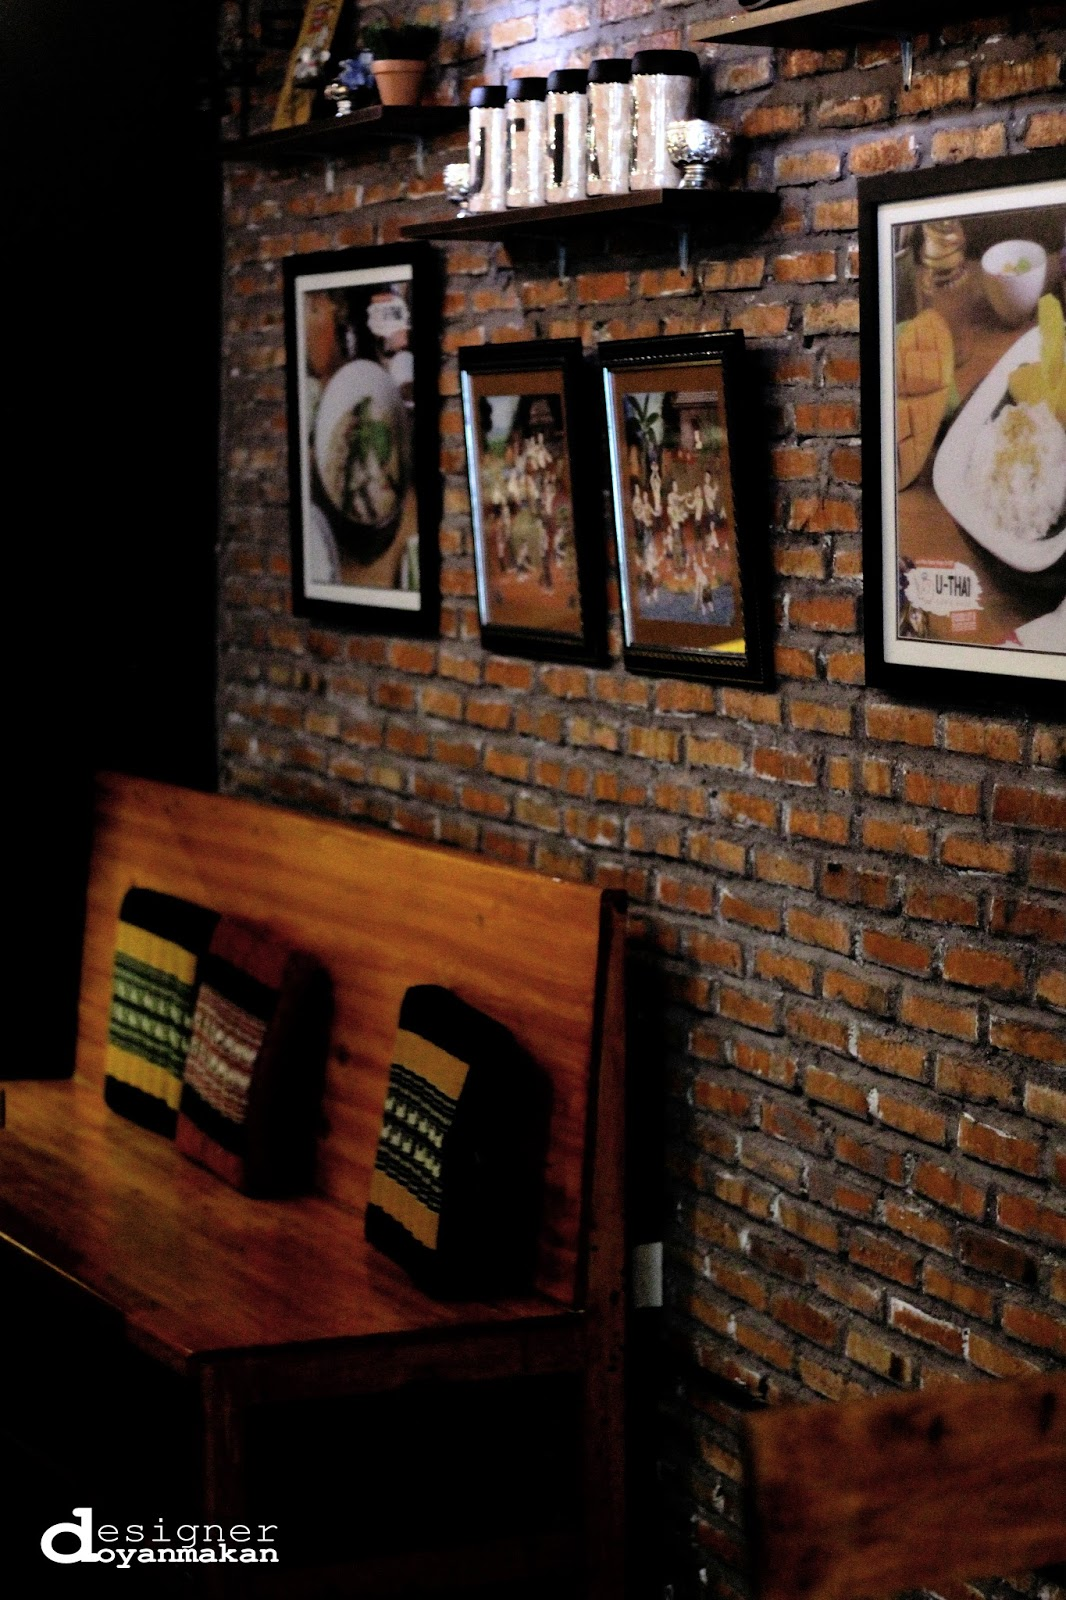 designer doyan makan: u-thai cafe & resto, the foundry 8, scbd